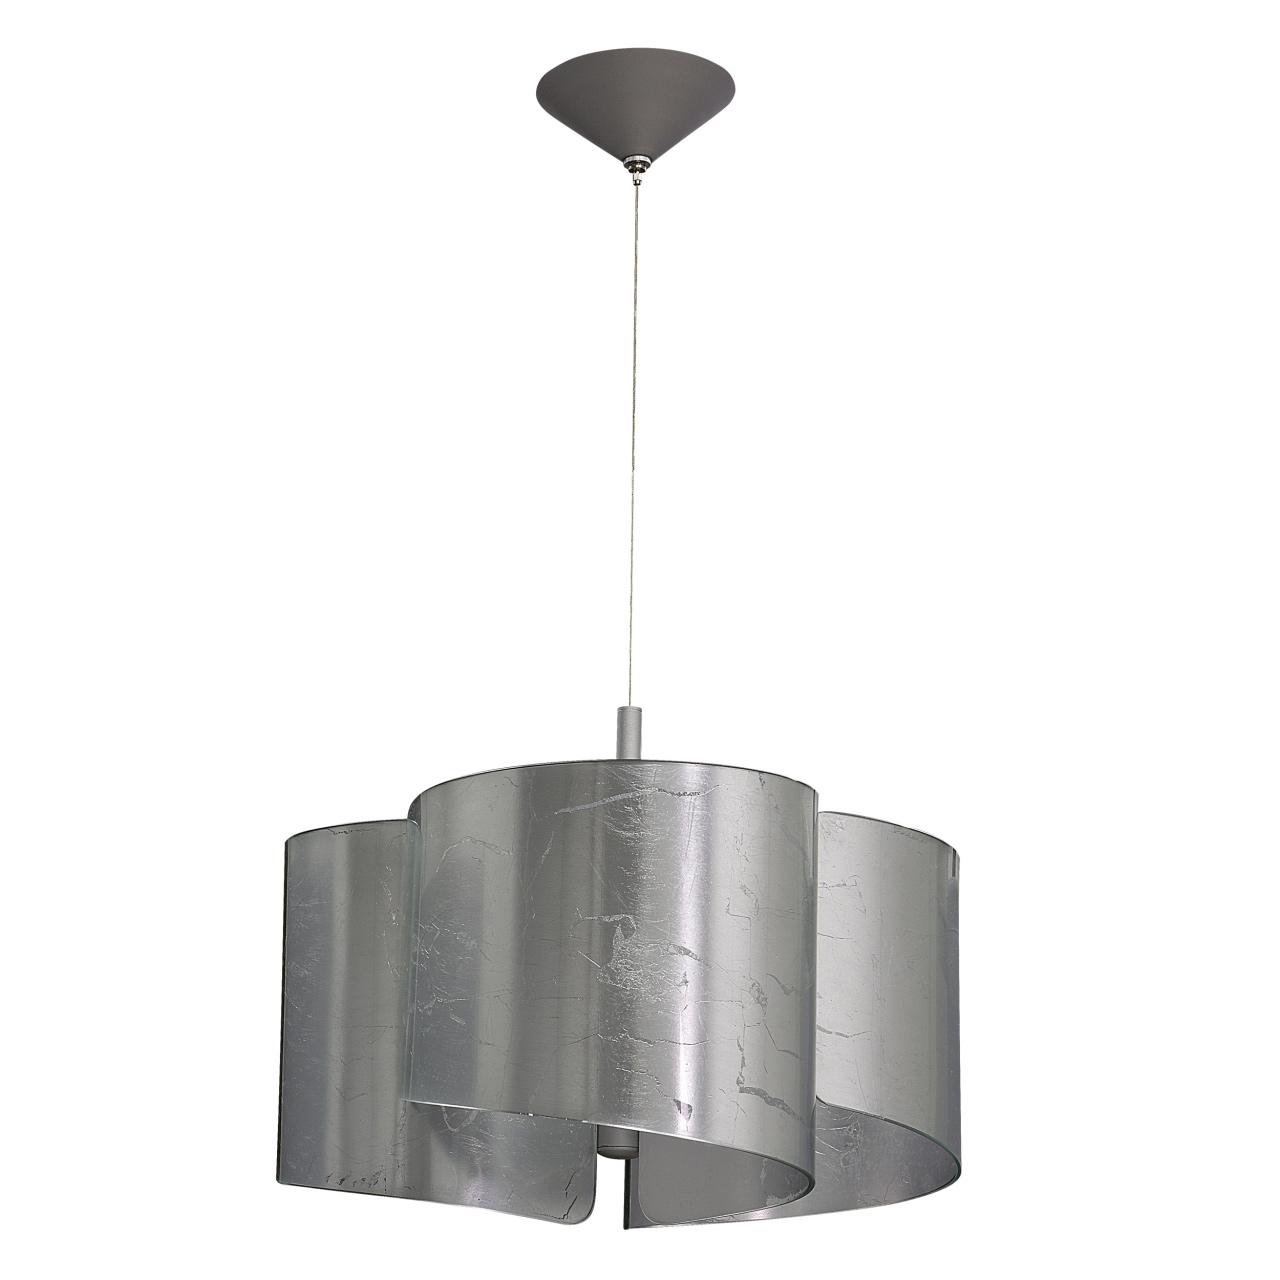 Люстра подвесная Pittore 3х40W E27 silver Lightstar 811134